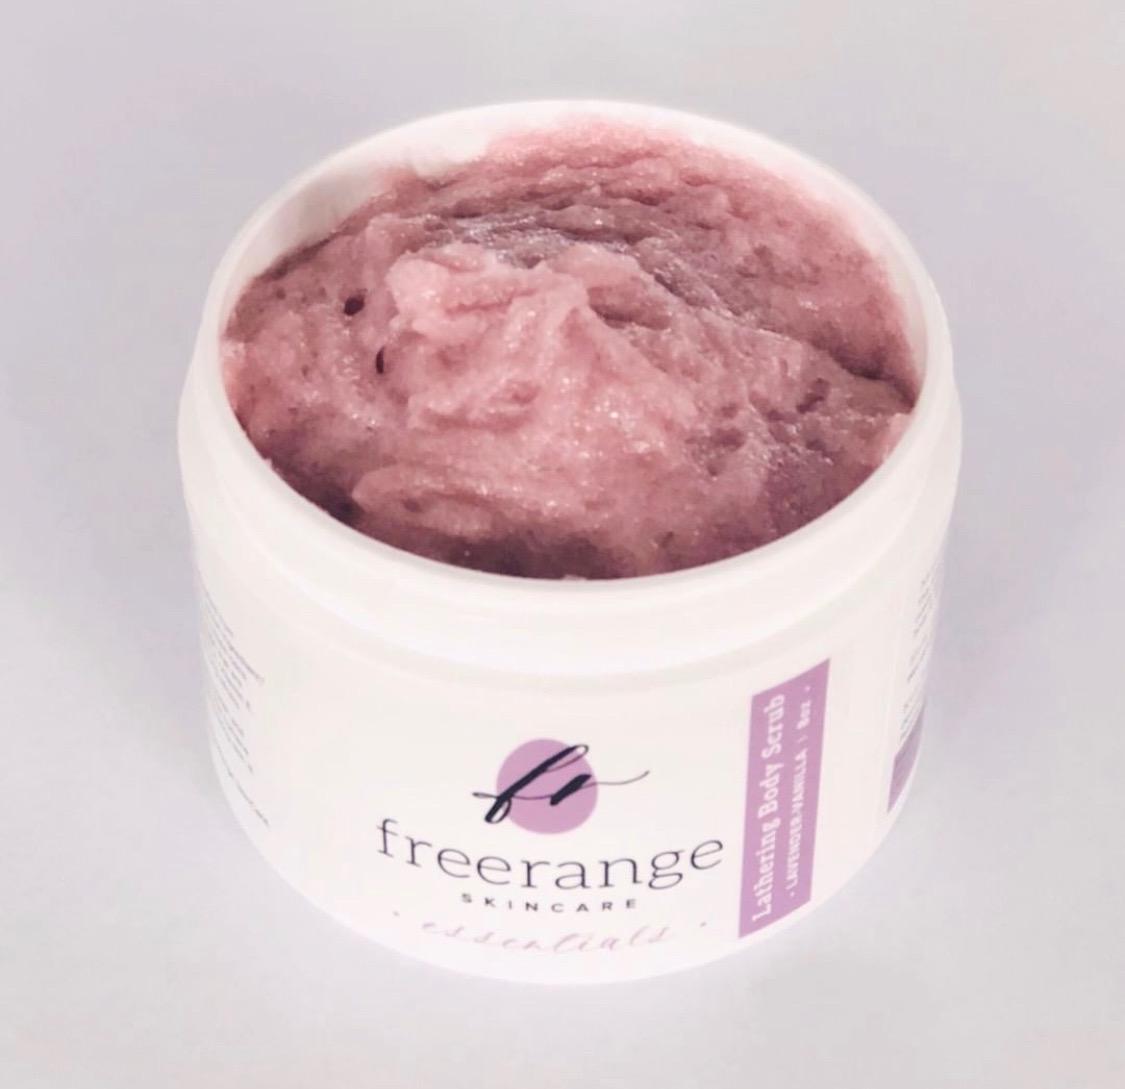 Freerange Skincare